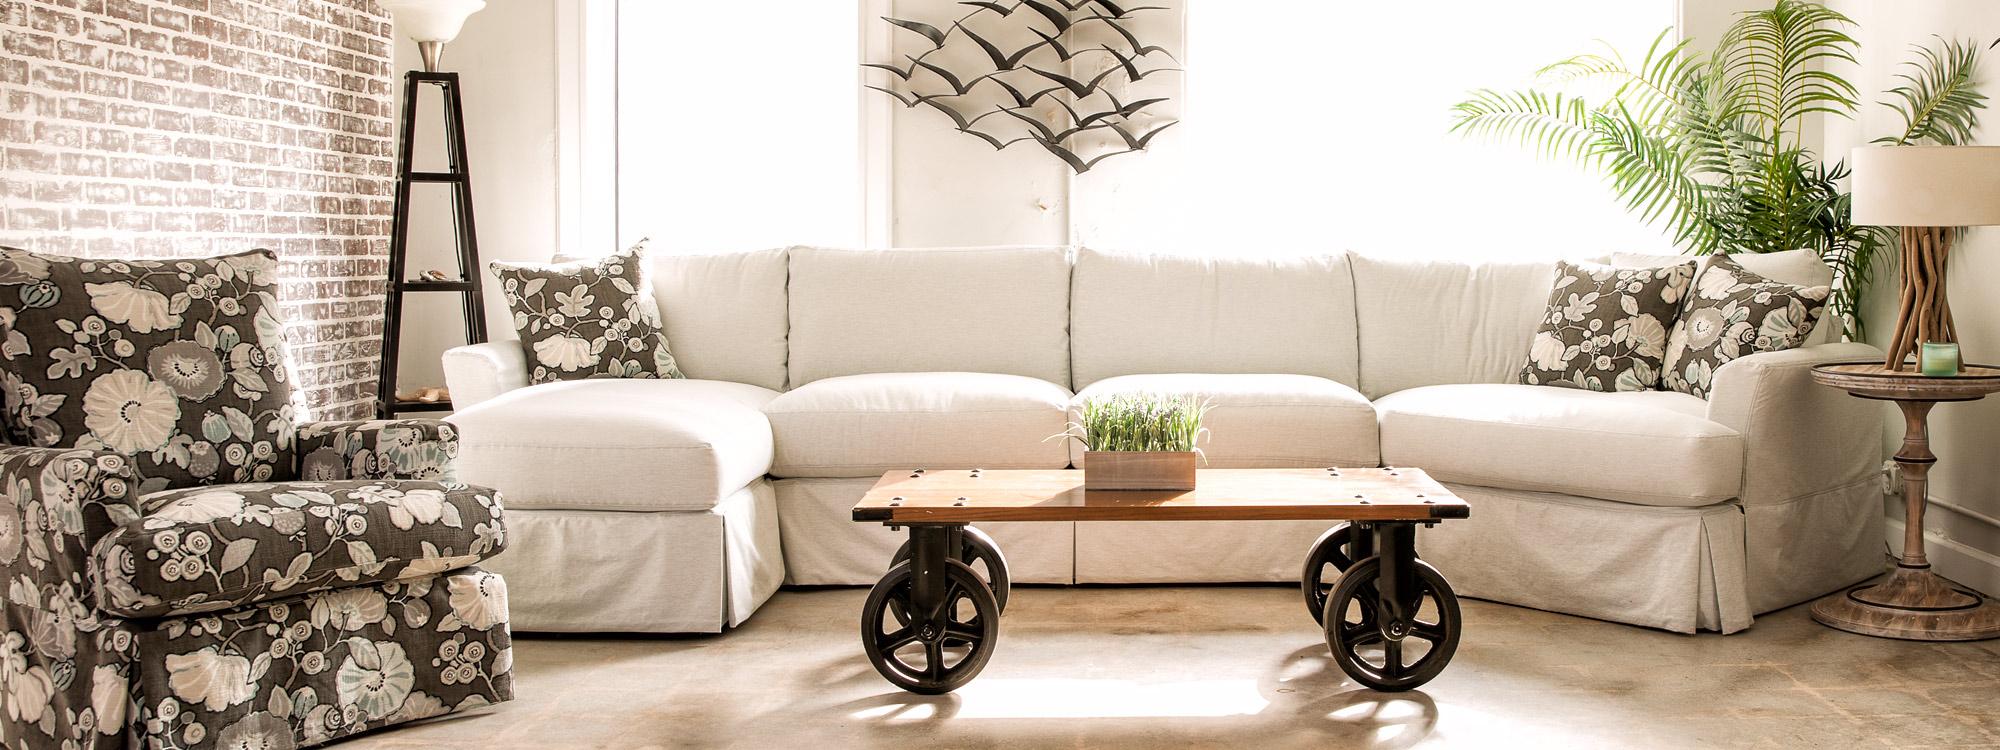 City Furniture Furniture Outlet Panama City Fl